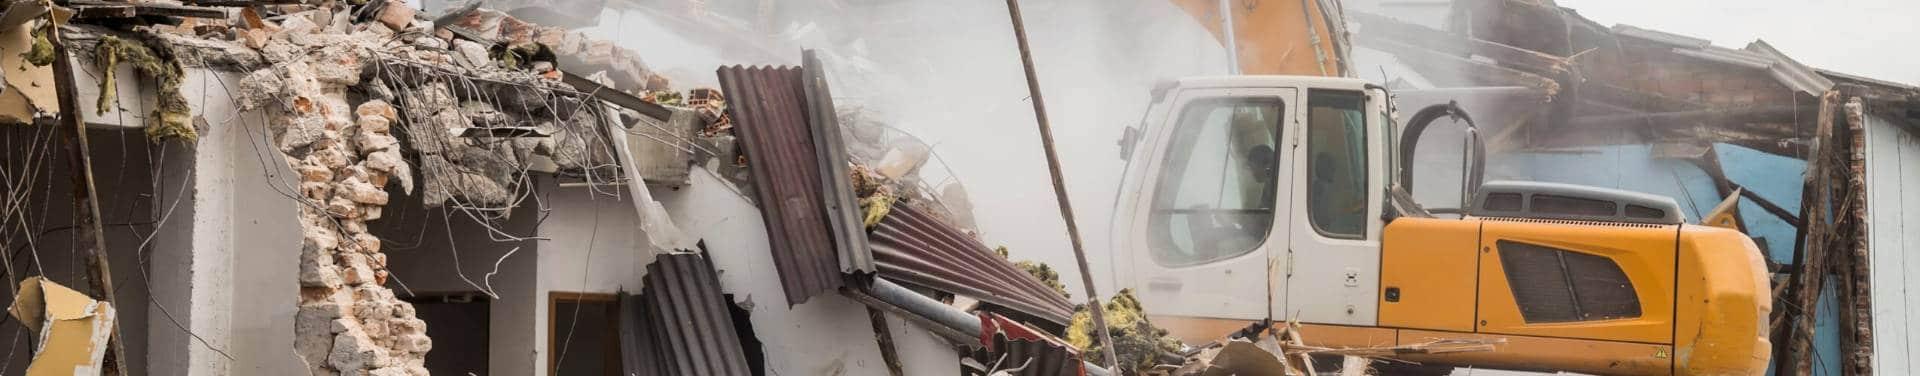 excavator demolishing a building in gretna la